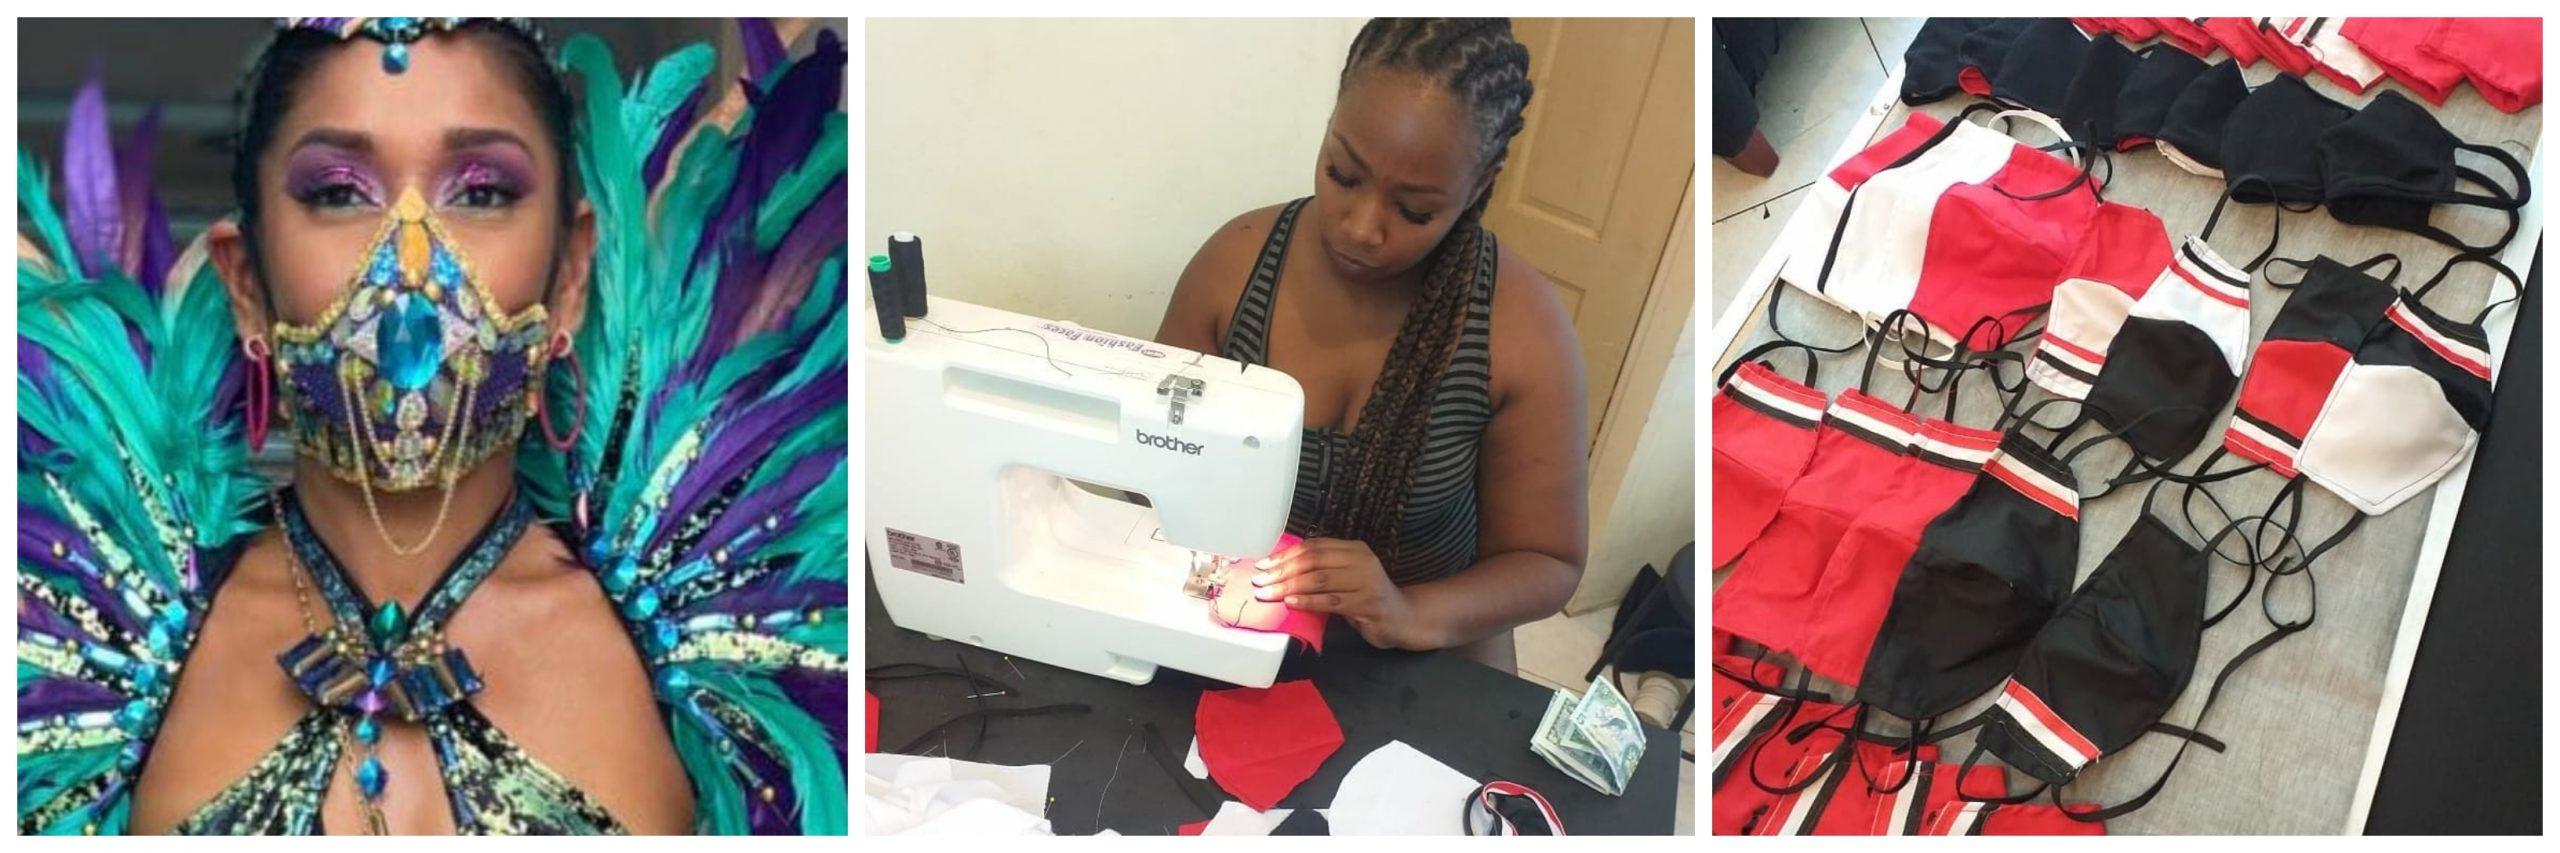 Trinidad and Tobago mask designer Jamila Harewood